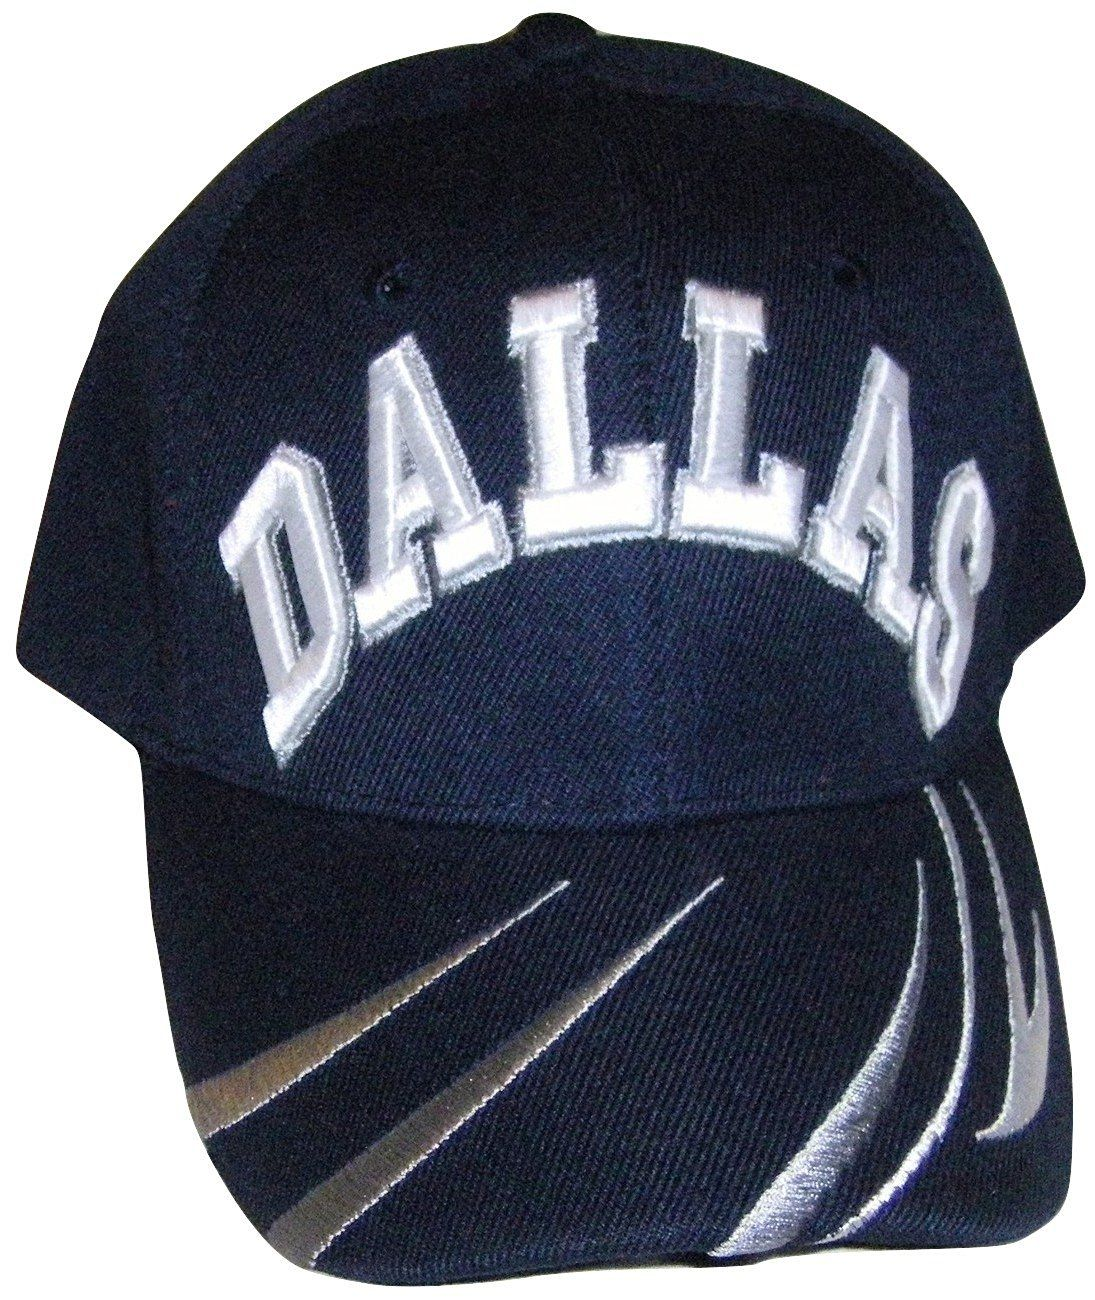 reputable site 454a8 65f40 Dallas Adjustable OSFA Baseball Cap with Velcro Enclosure, Price   7.95 -  Save   5.04